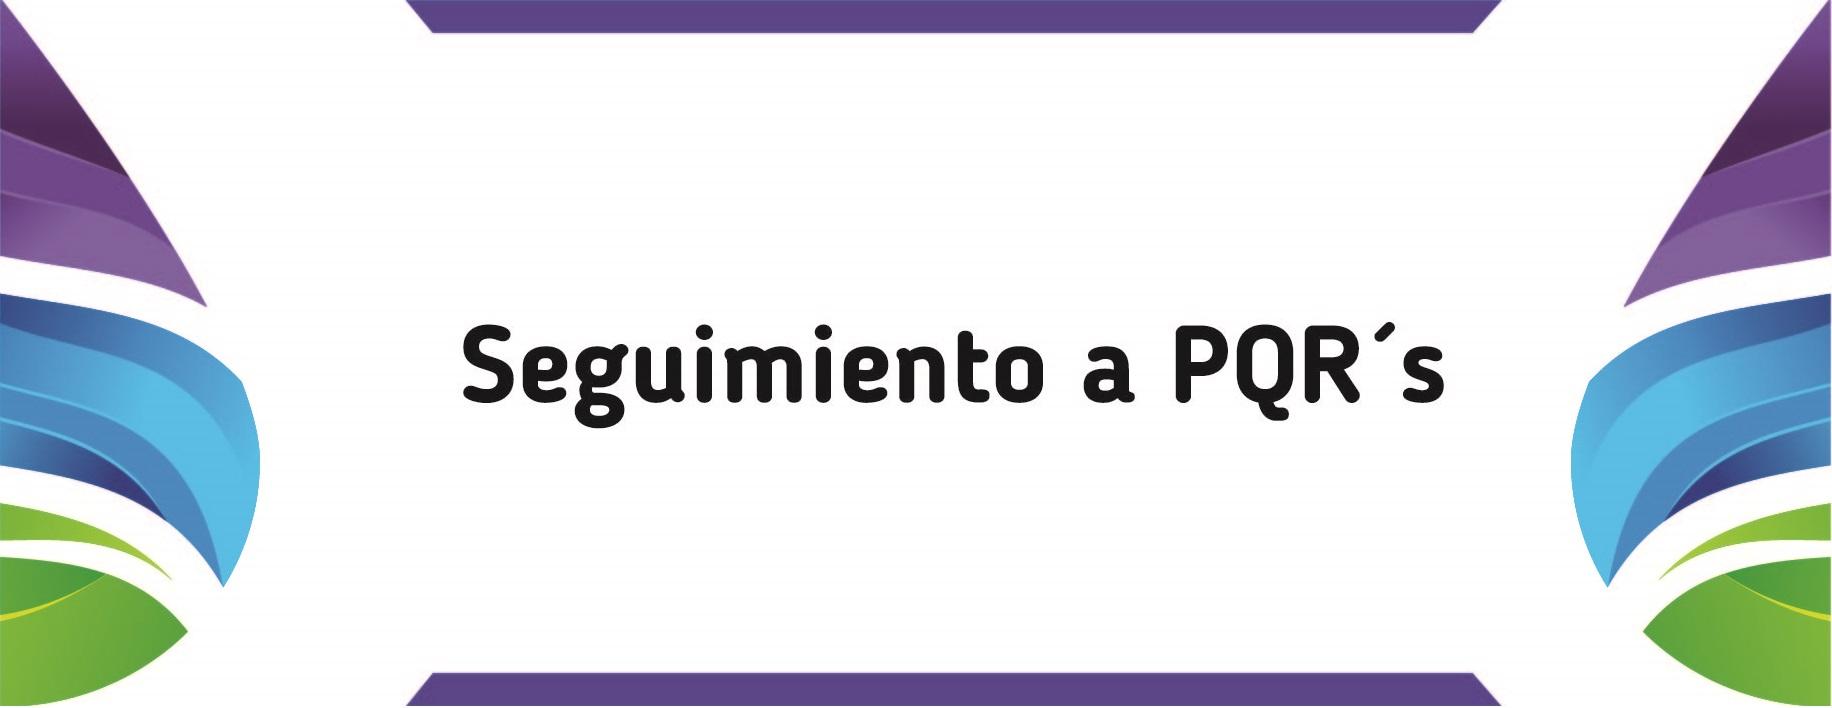 seguimiento pqrs